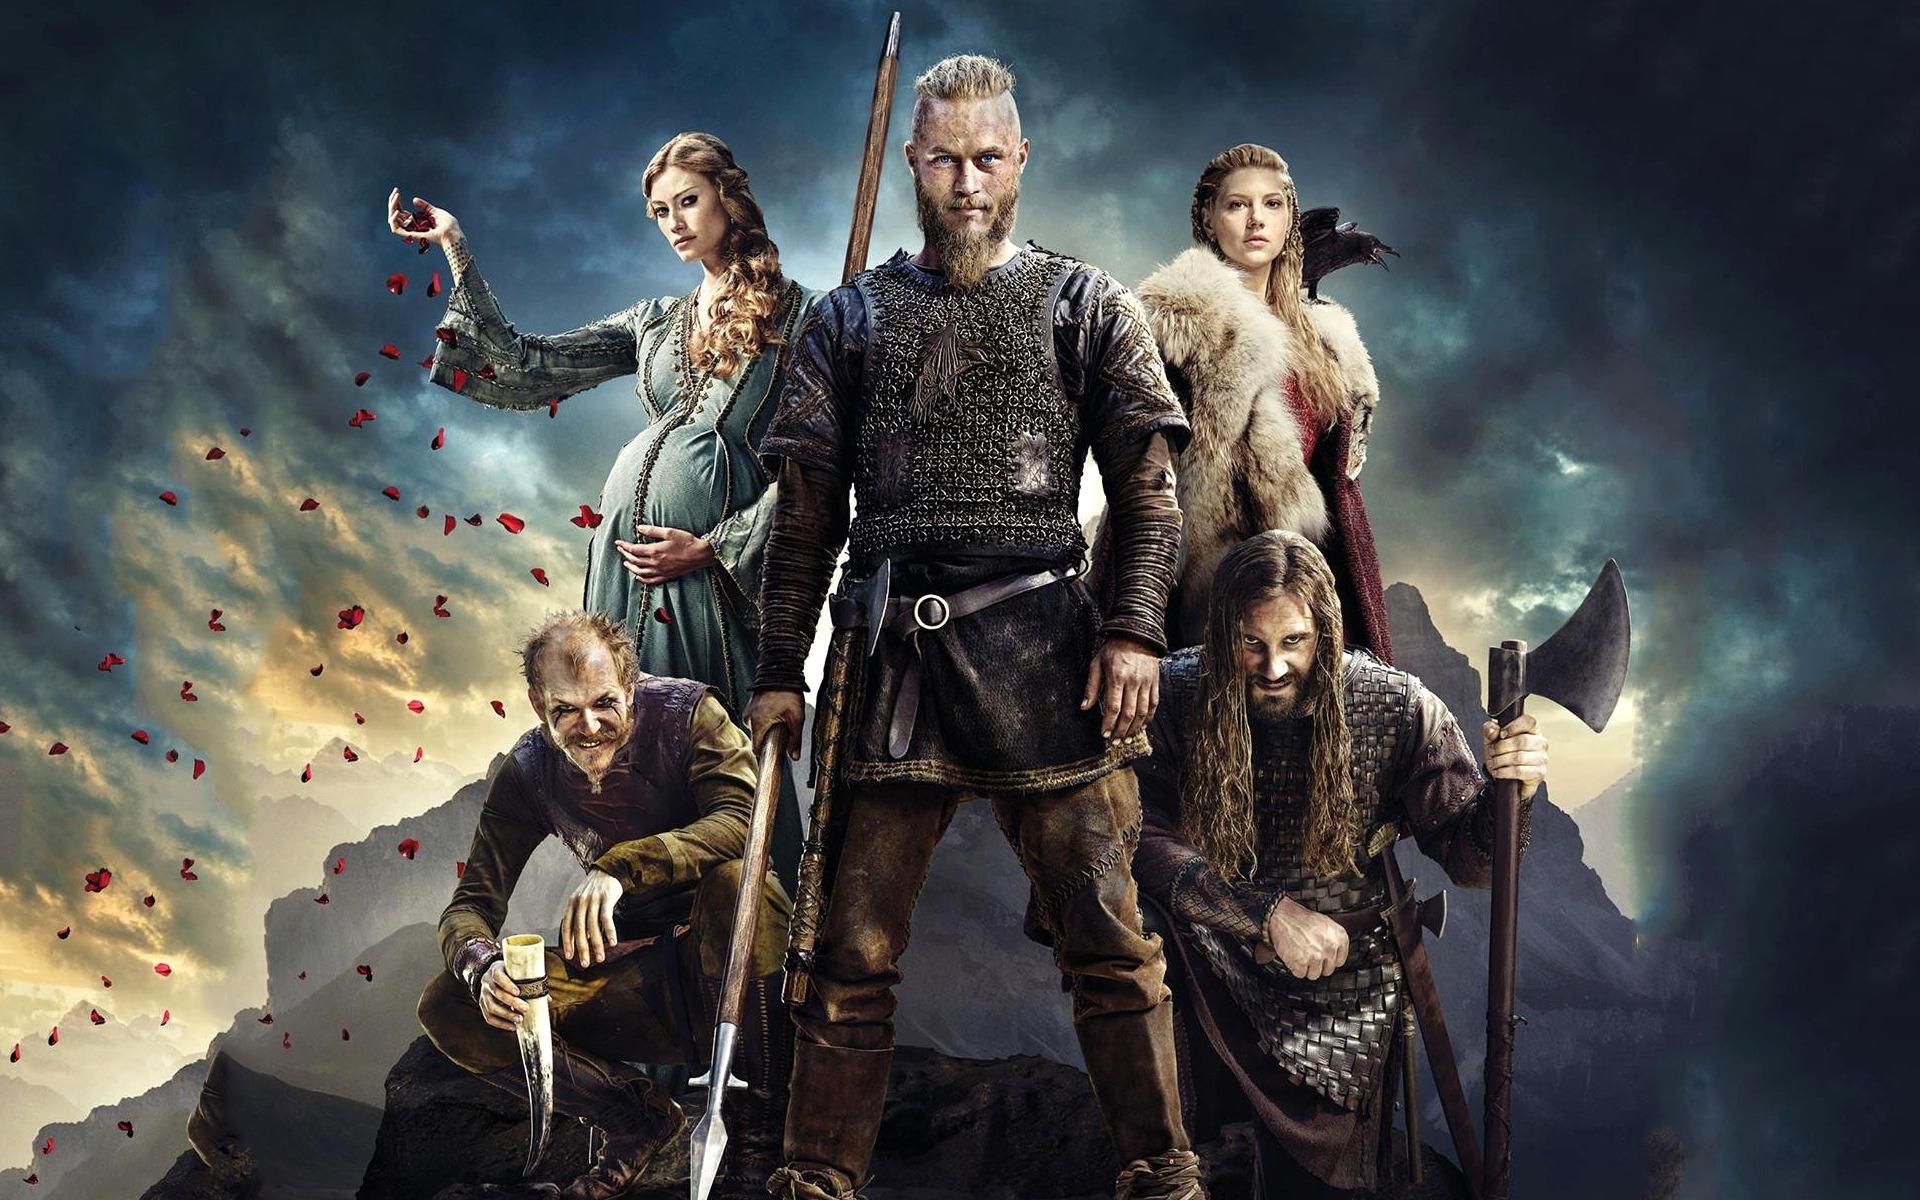 Vikings Season 4 Wallpapers Hd Wallpapers